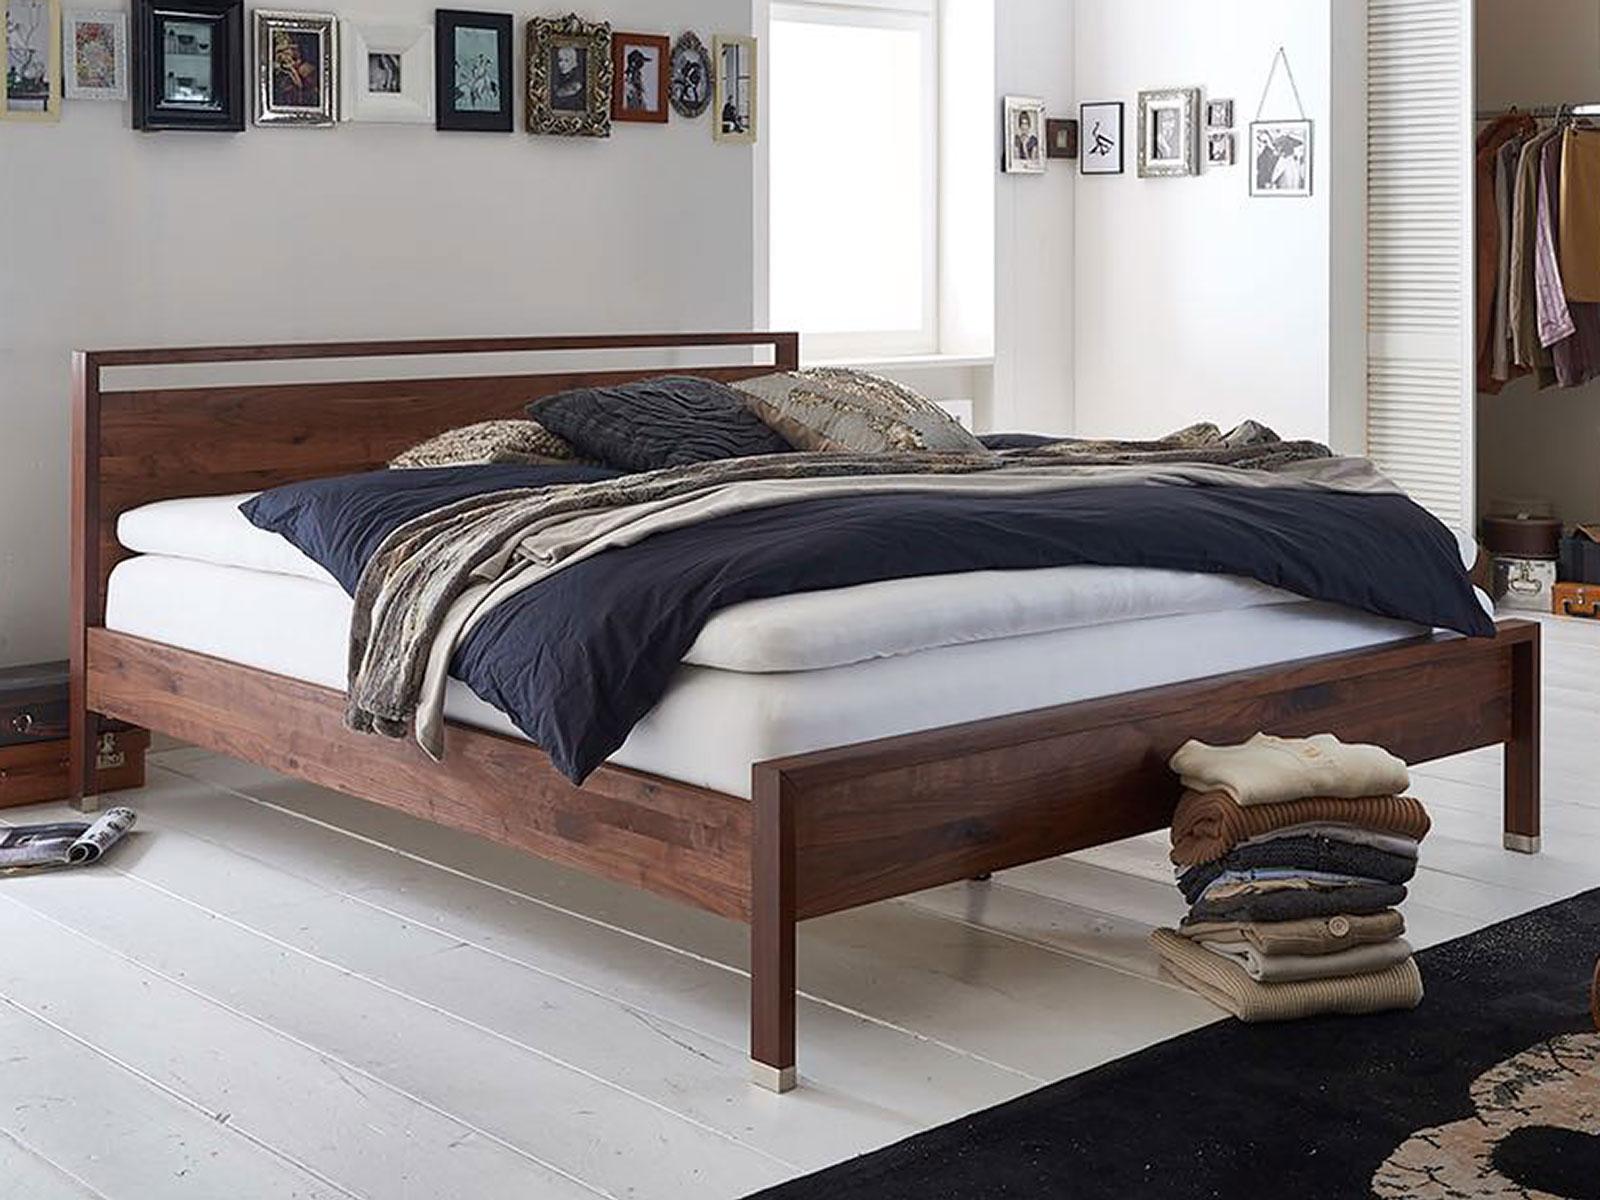 modular massivholzbett tenero plus nussbaum massiv natur ge lt betten prinz gmbh. Black Bedroom Furniture Sets. Home Design Ideas